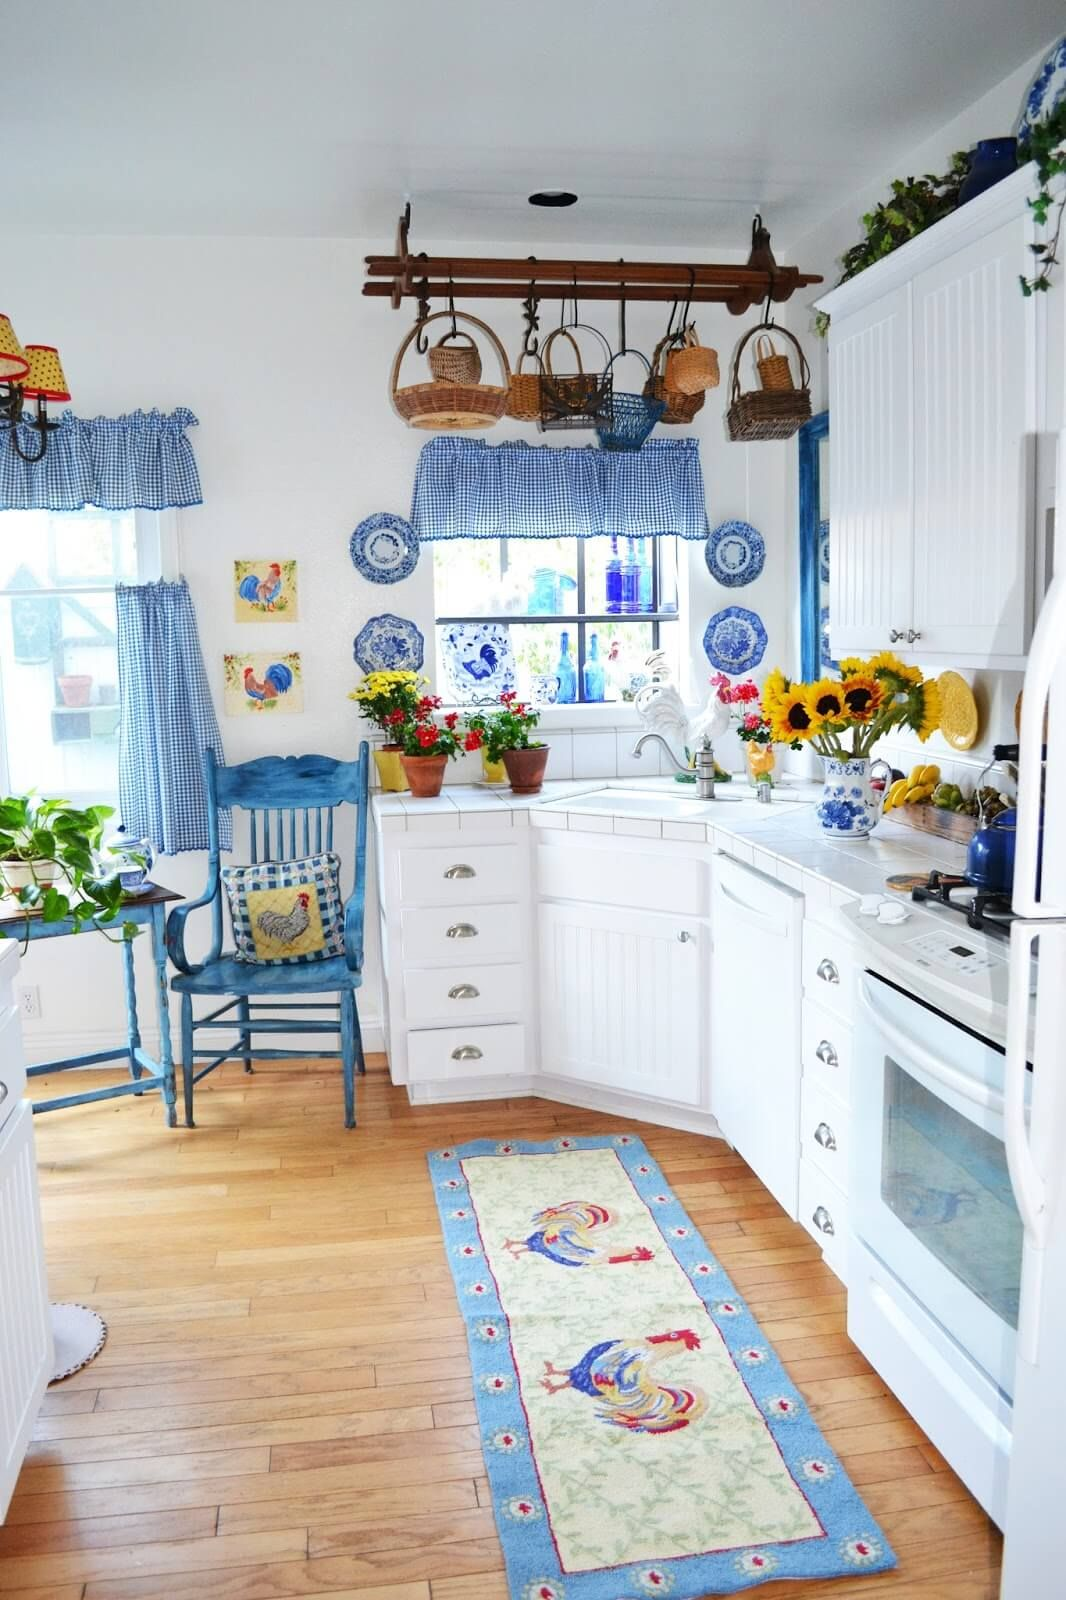 9 Light Blue Kitchen Design and Decor ideas to Make Your Kitchen ...